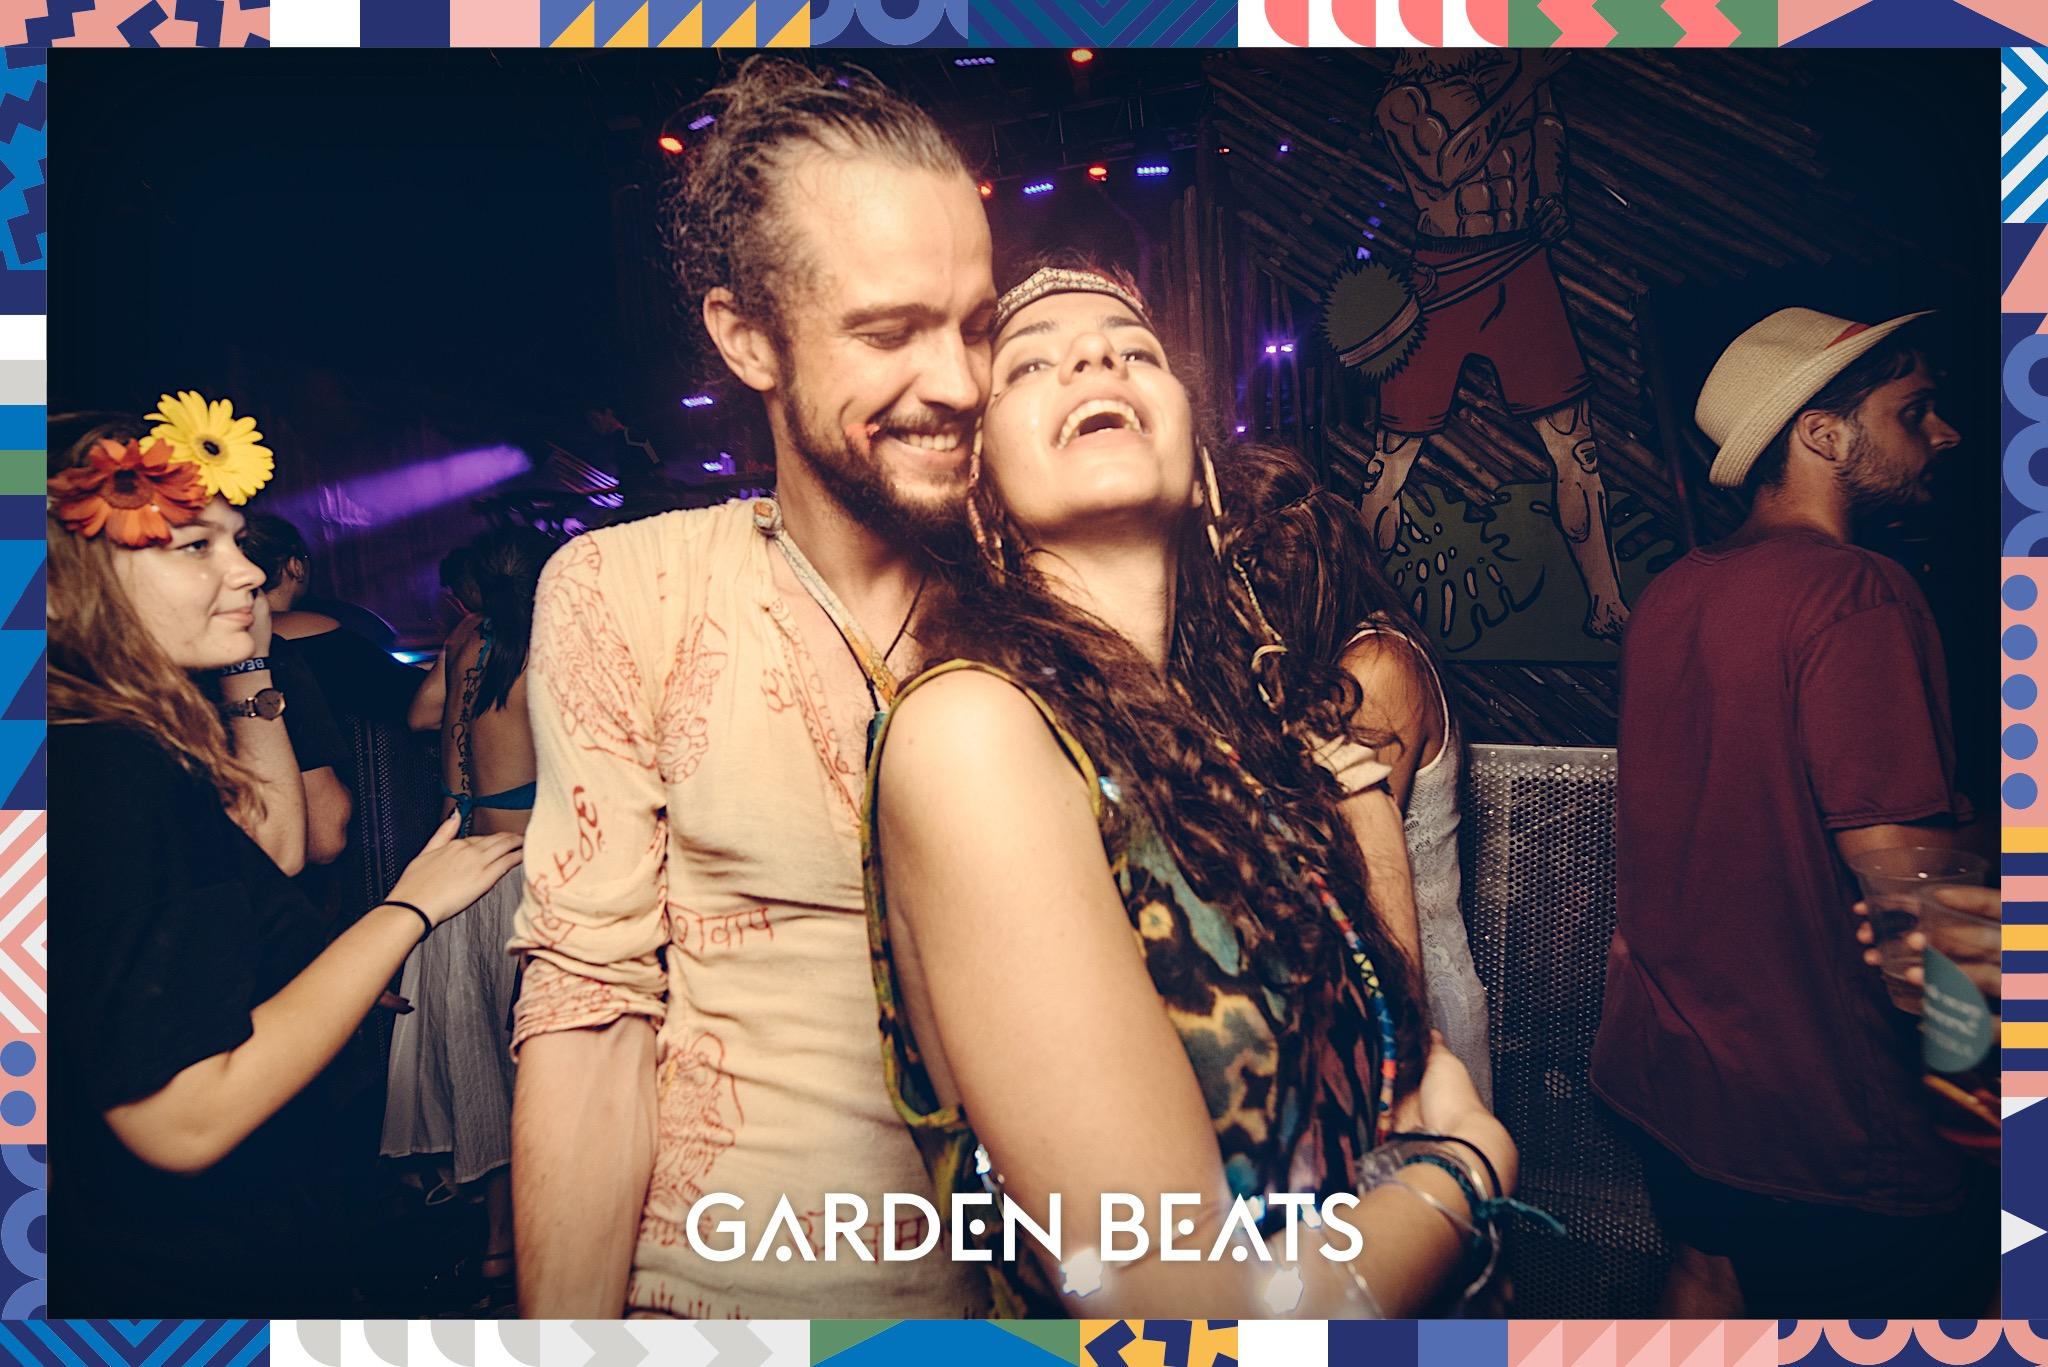 18032017_GardenBeats_Colossal753_WatermarkedGB.jpg